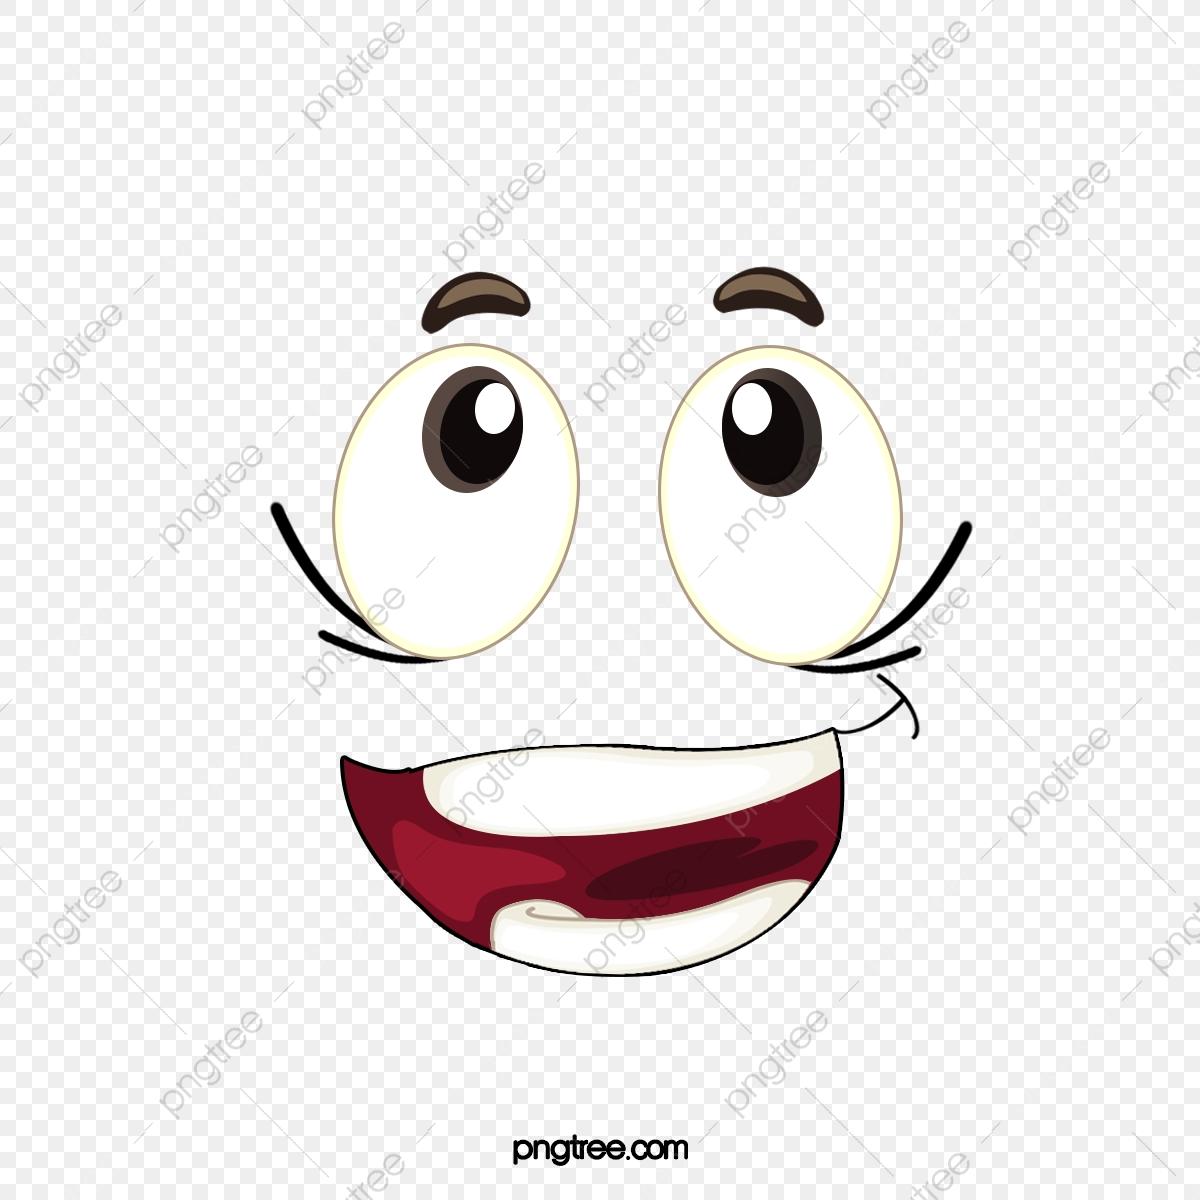 Cartoon Faces, Cartoon Clipart, Expression, Cartoon PNG Transparent.